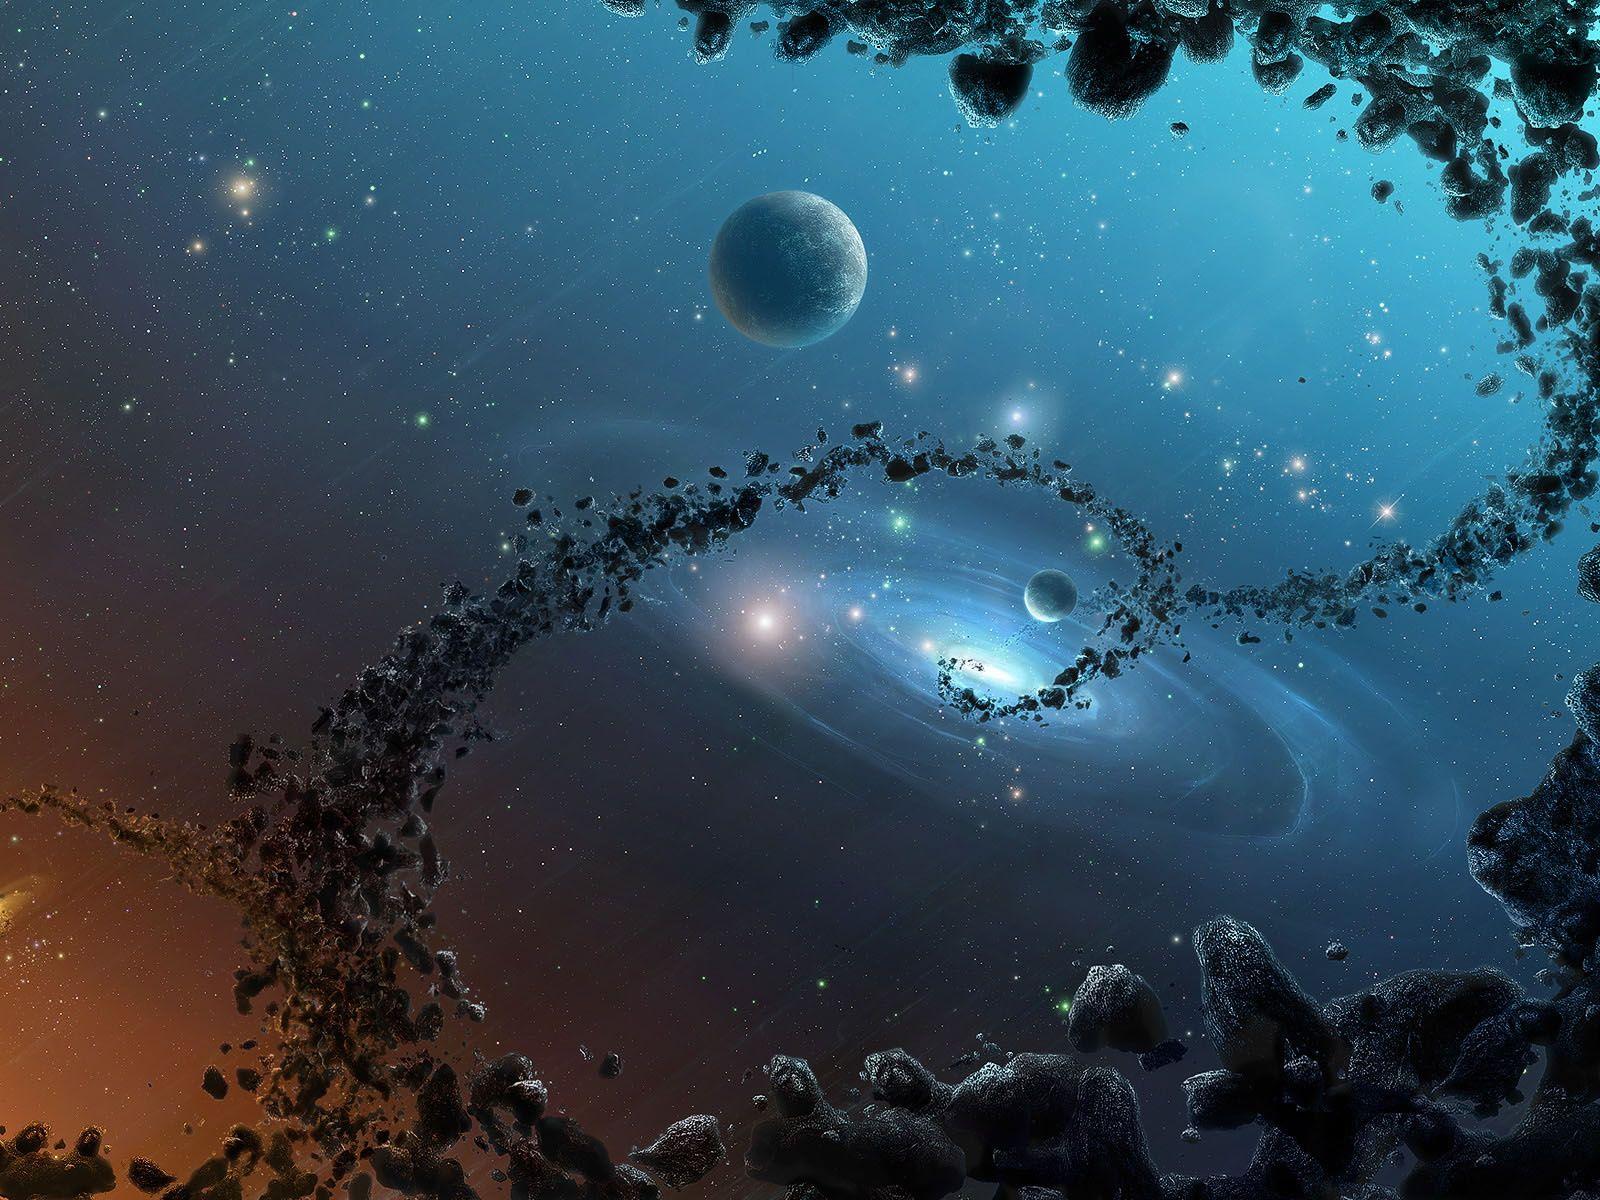 Wallpaper 3d Free Download Sci Fi Wallpaper Planets Wallpaper Galaxy Wallpaper